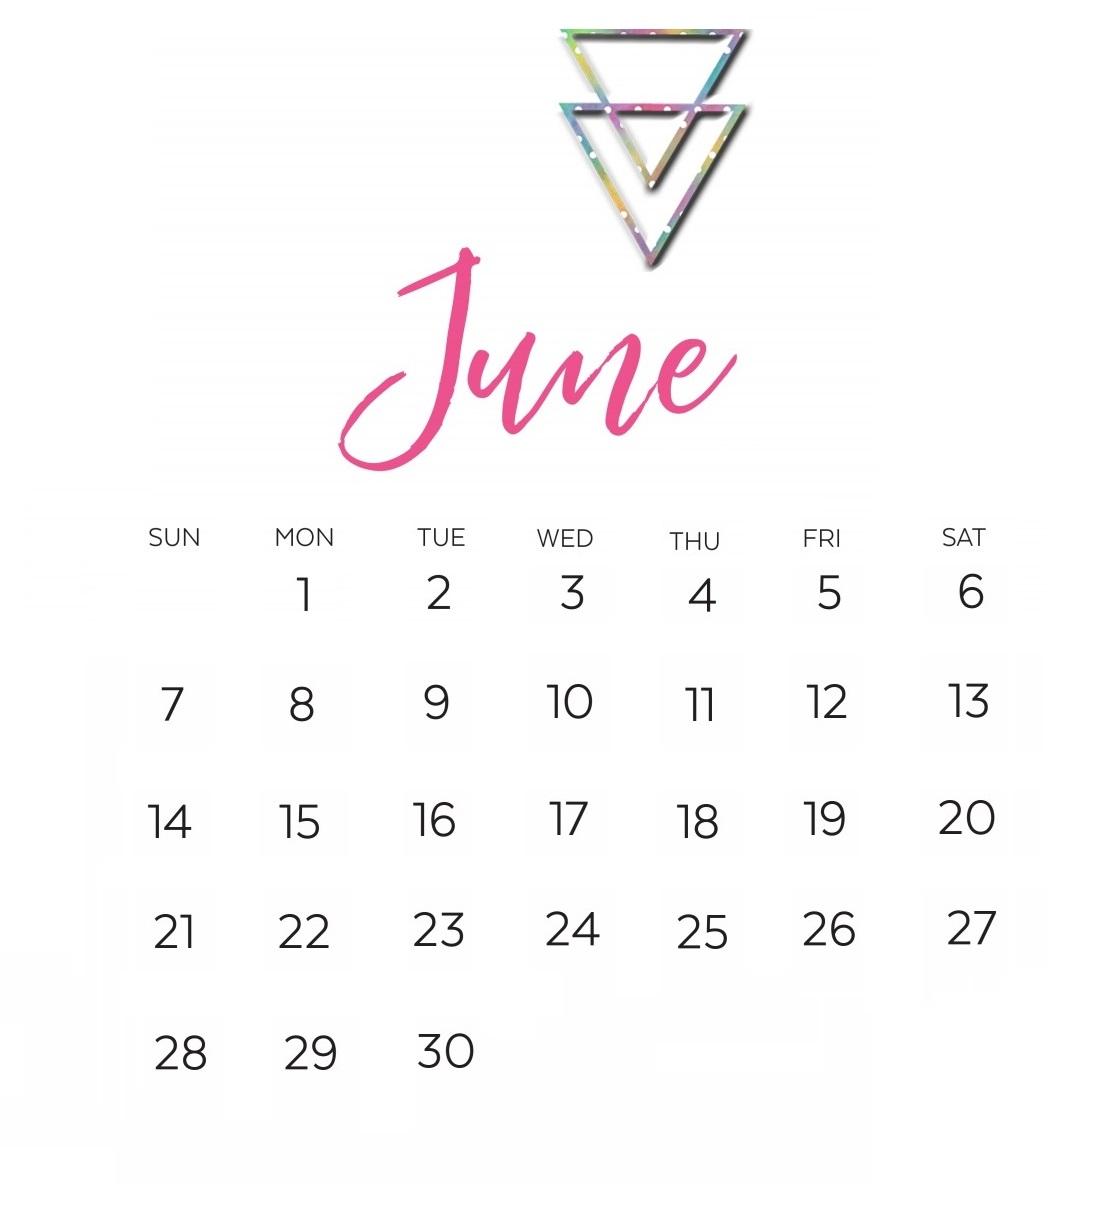 Calligraphy June 2020 Desk Calendar